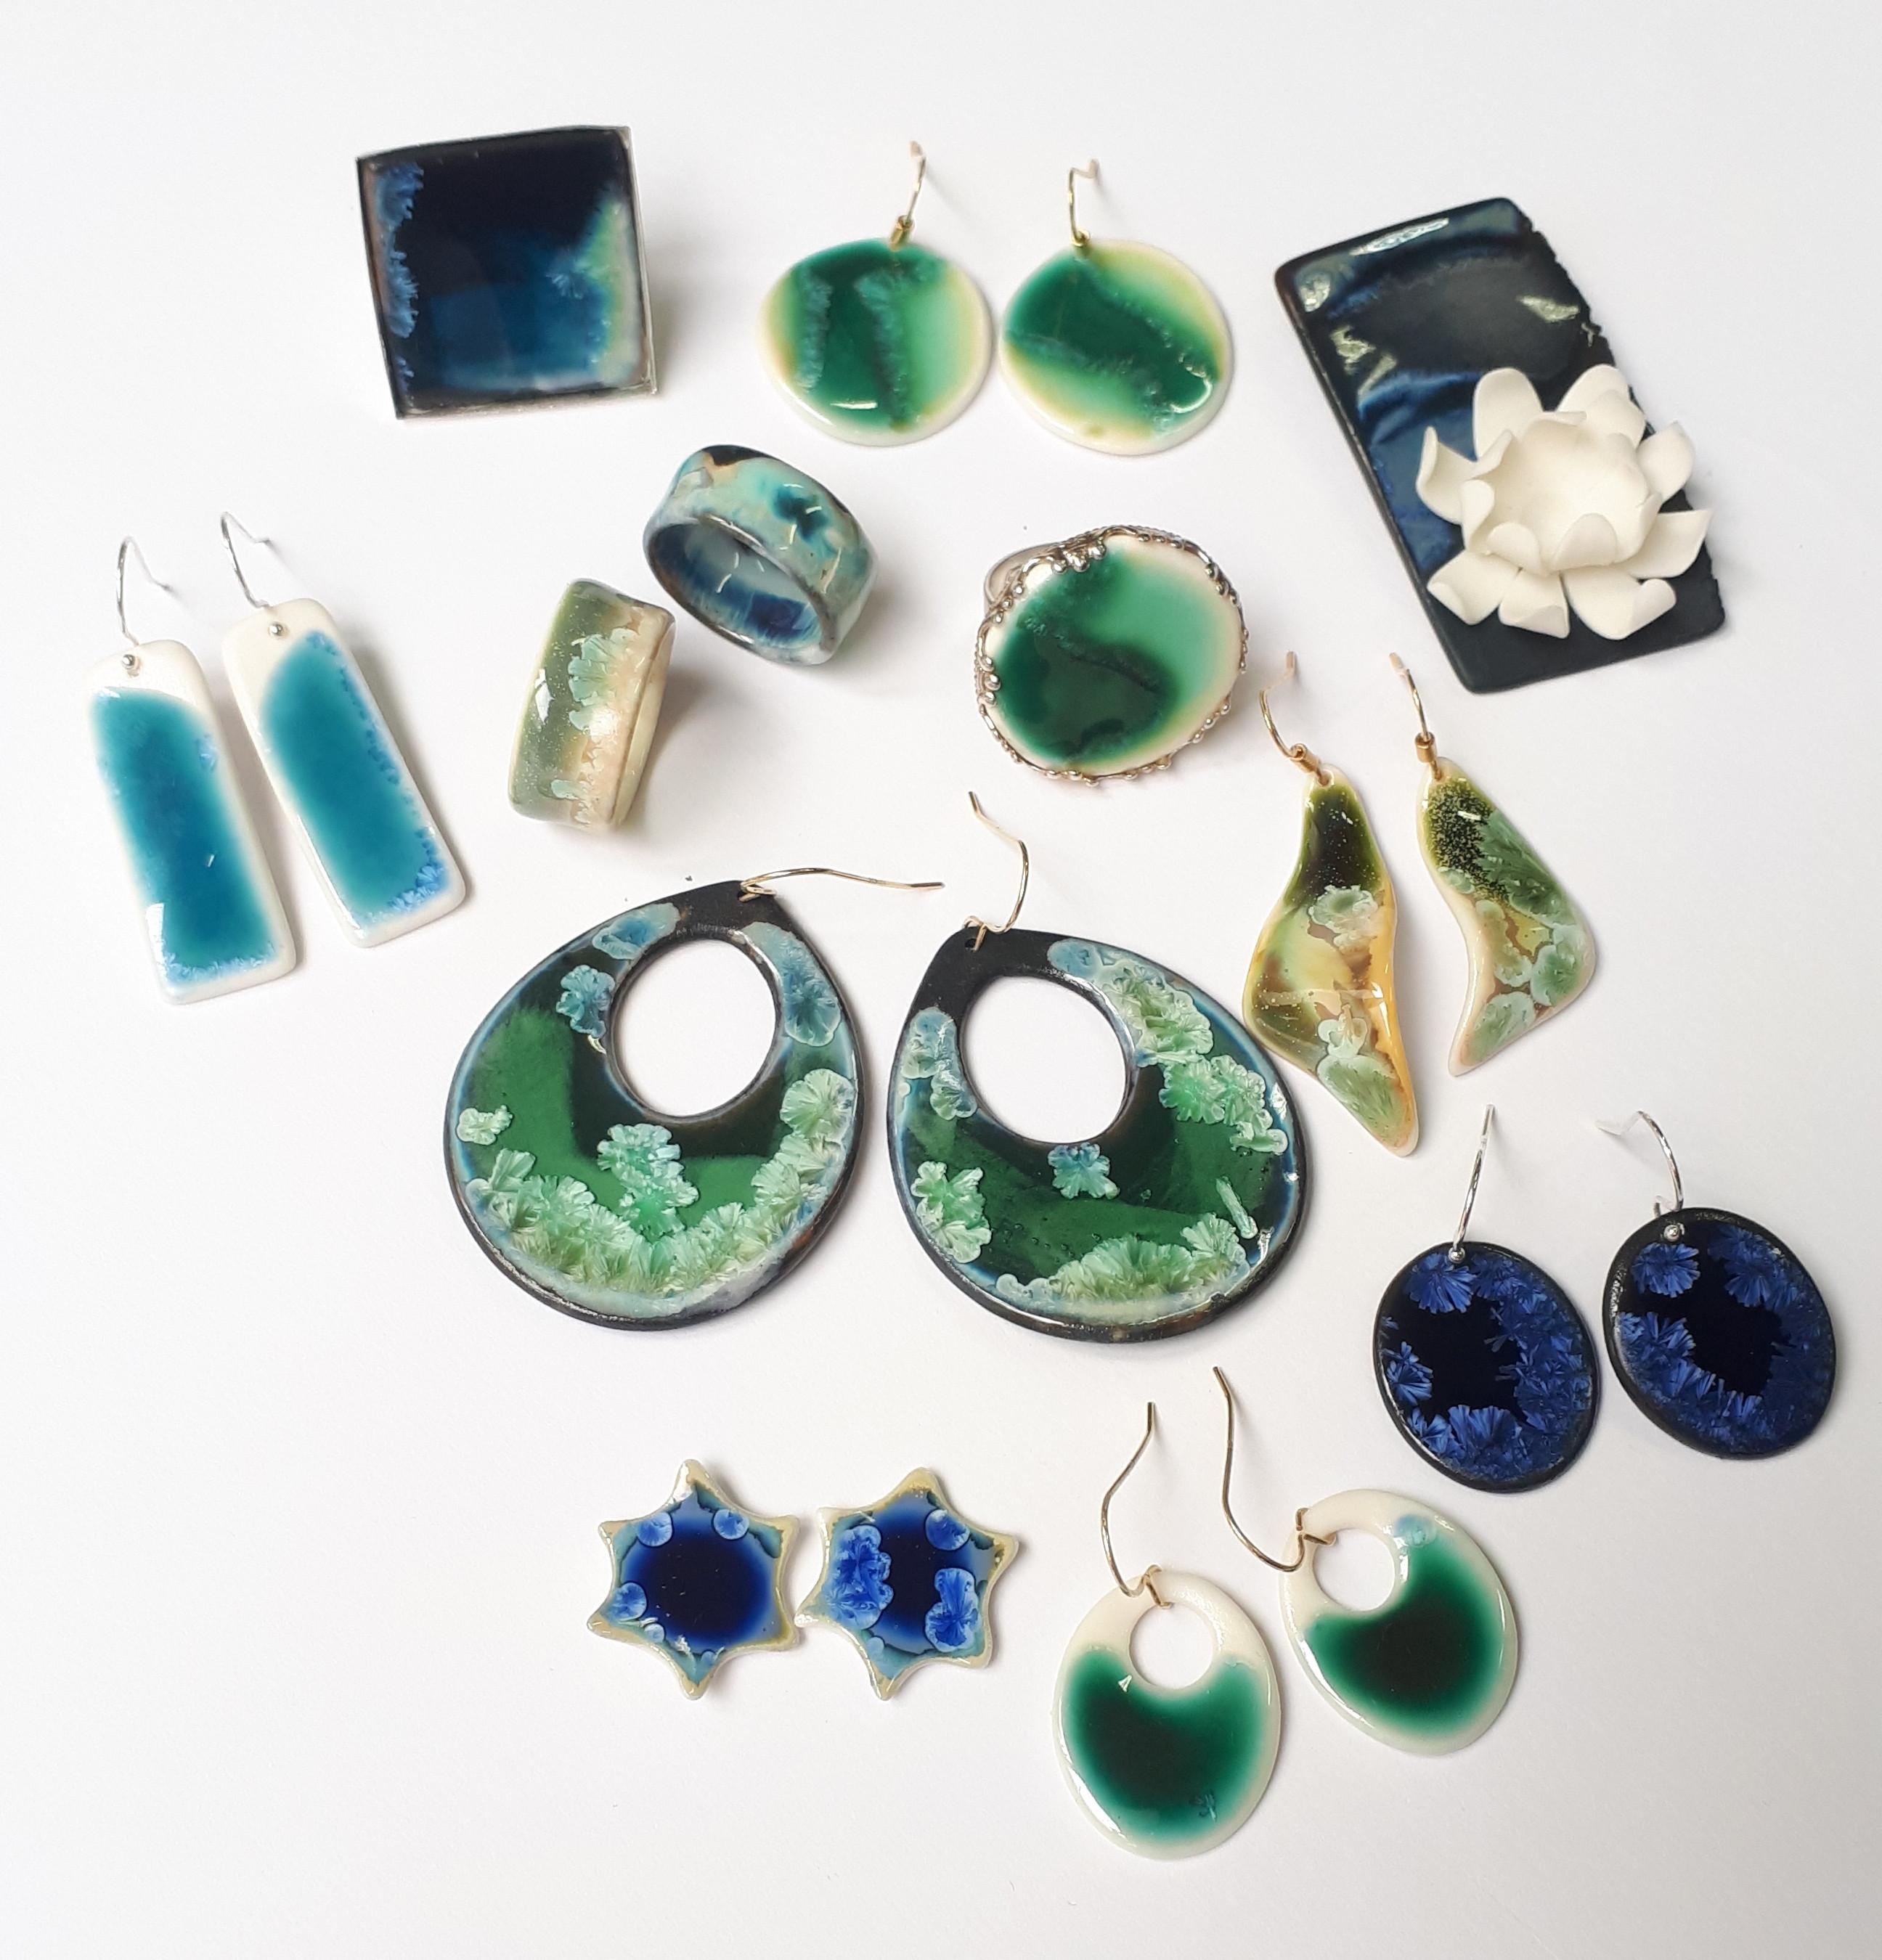 Fine Porcelain Jewellery Making Class